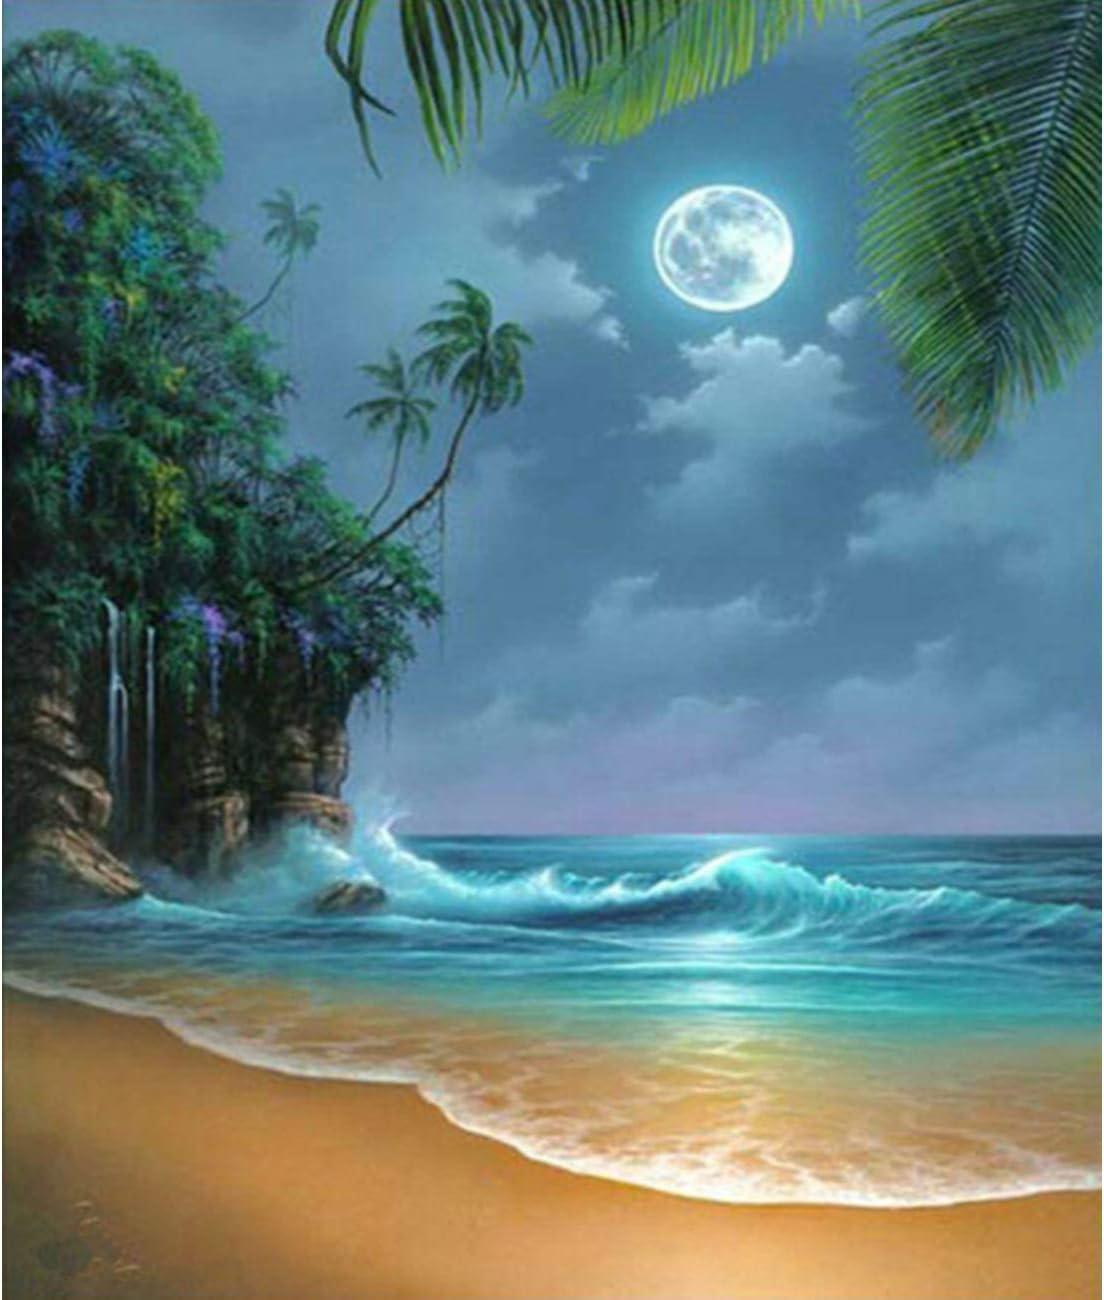 Amazon Com Diy 5d Diamond Painting Kit Full Diamond Seaside Moon Beach Embroidery Rhinestone Cross Stitch Arts Craft Supply For Home Wall Decor